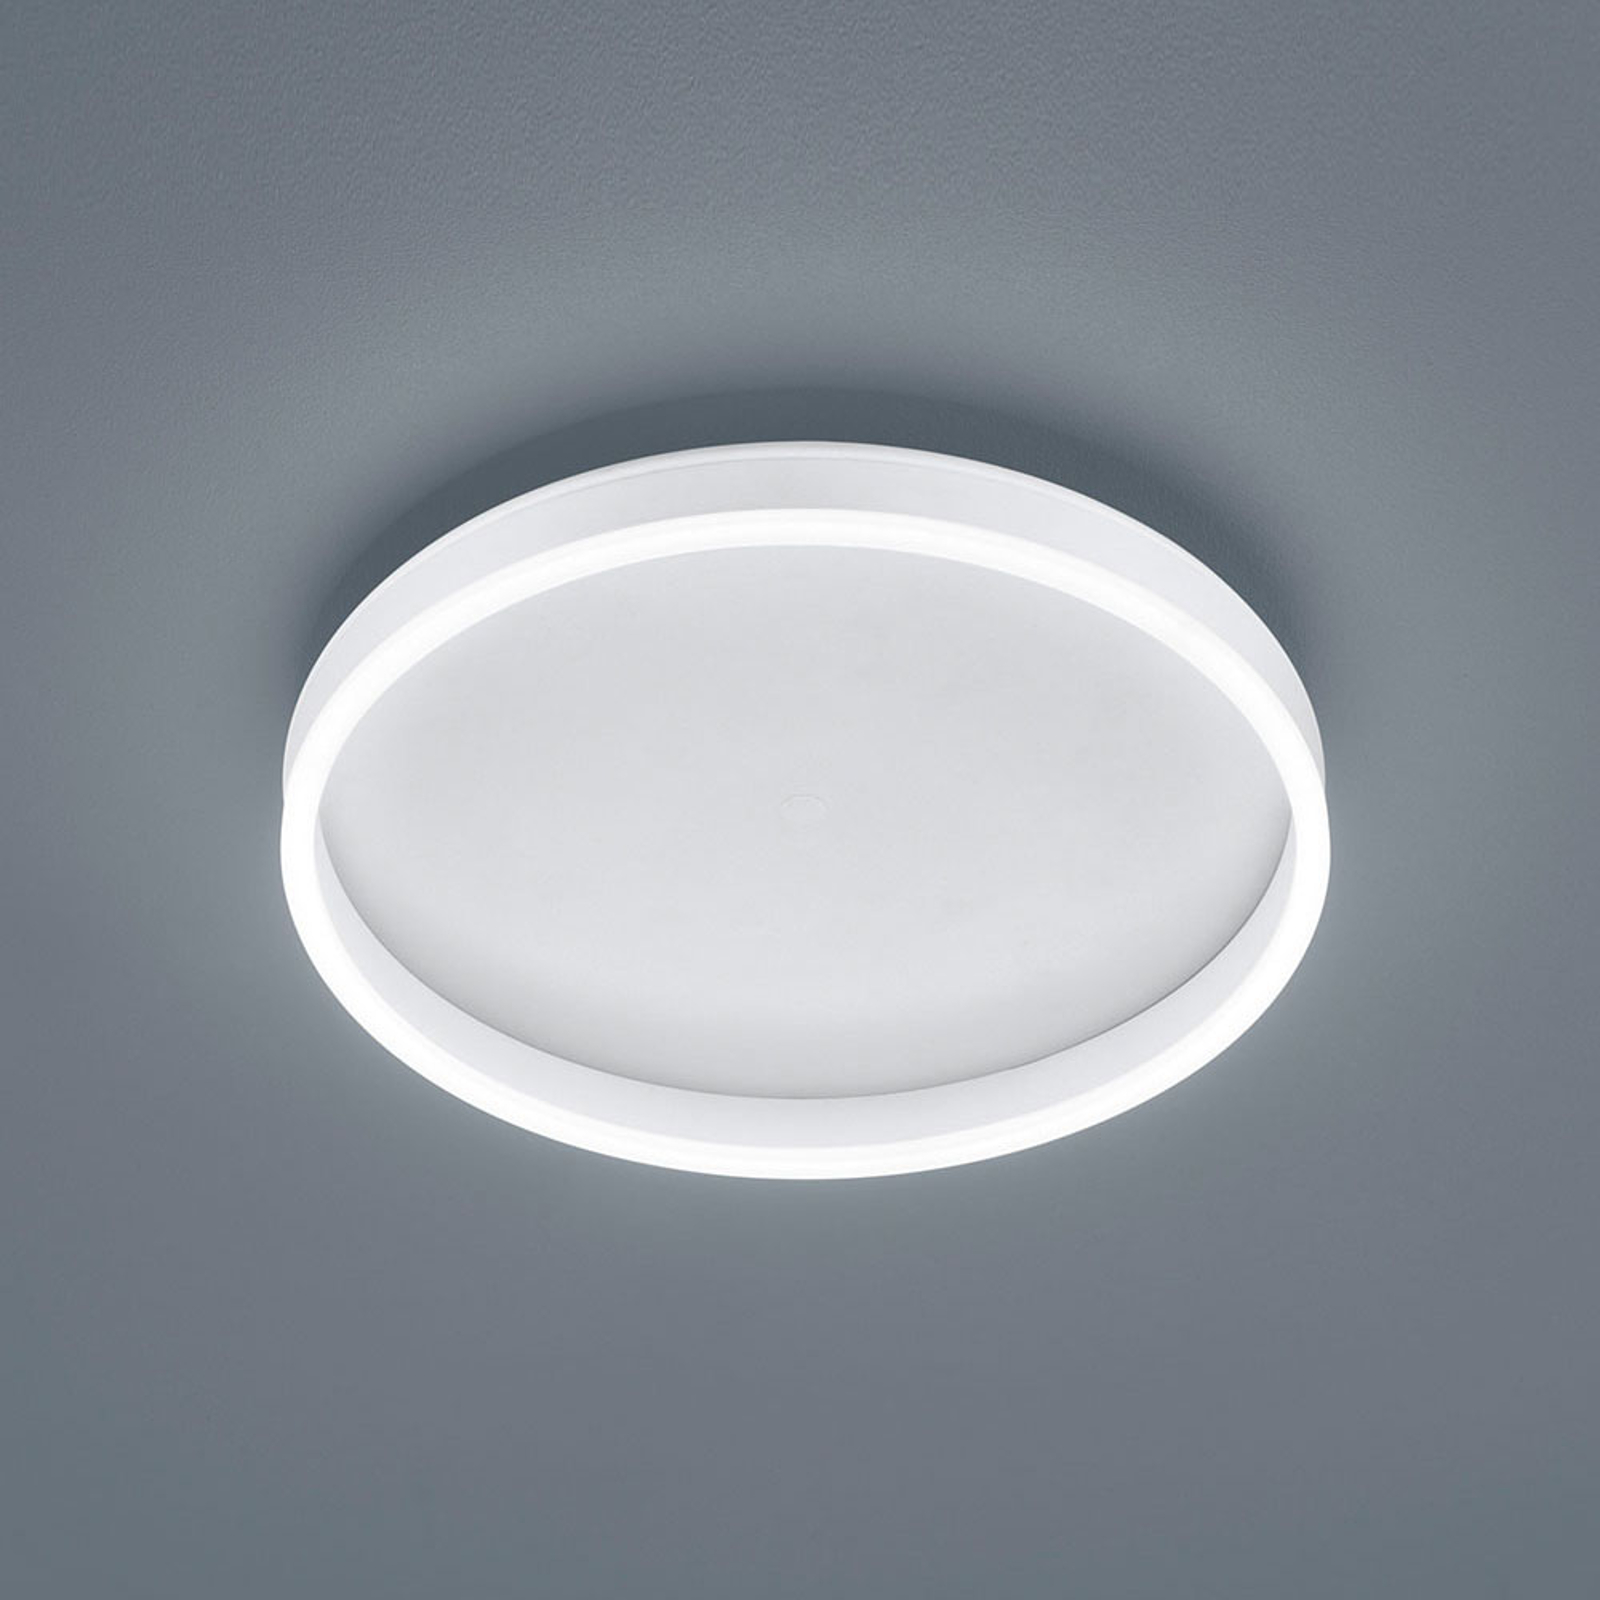 Helestra Sona lampa sufitowa LED Ø40cm biała